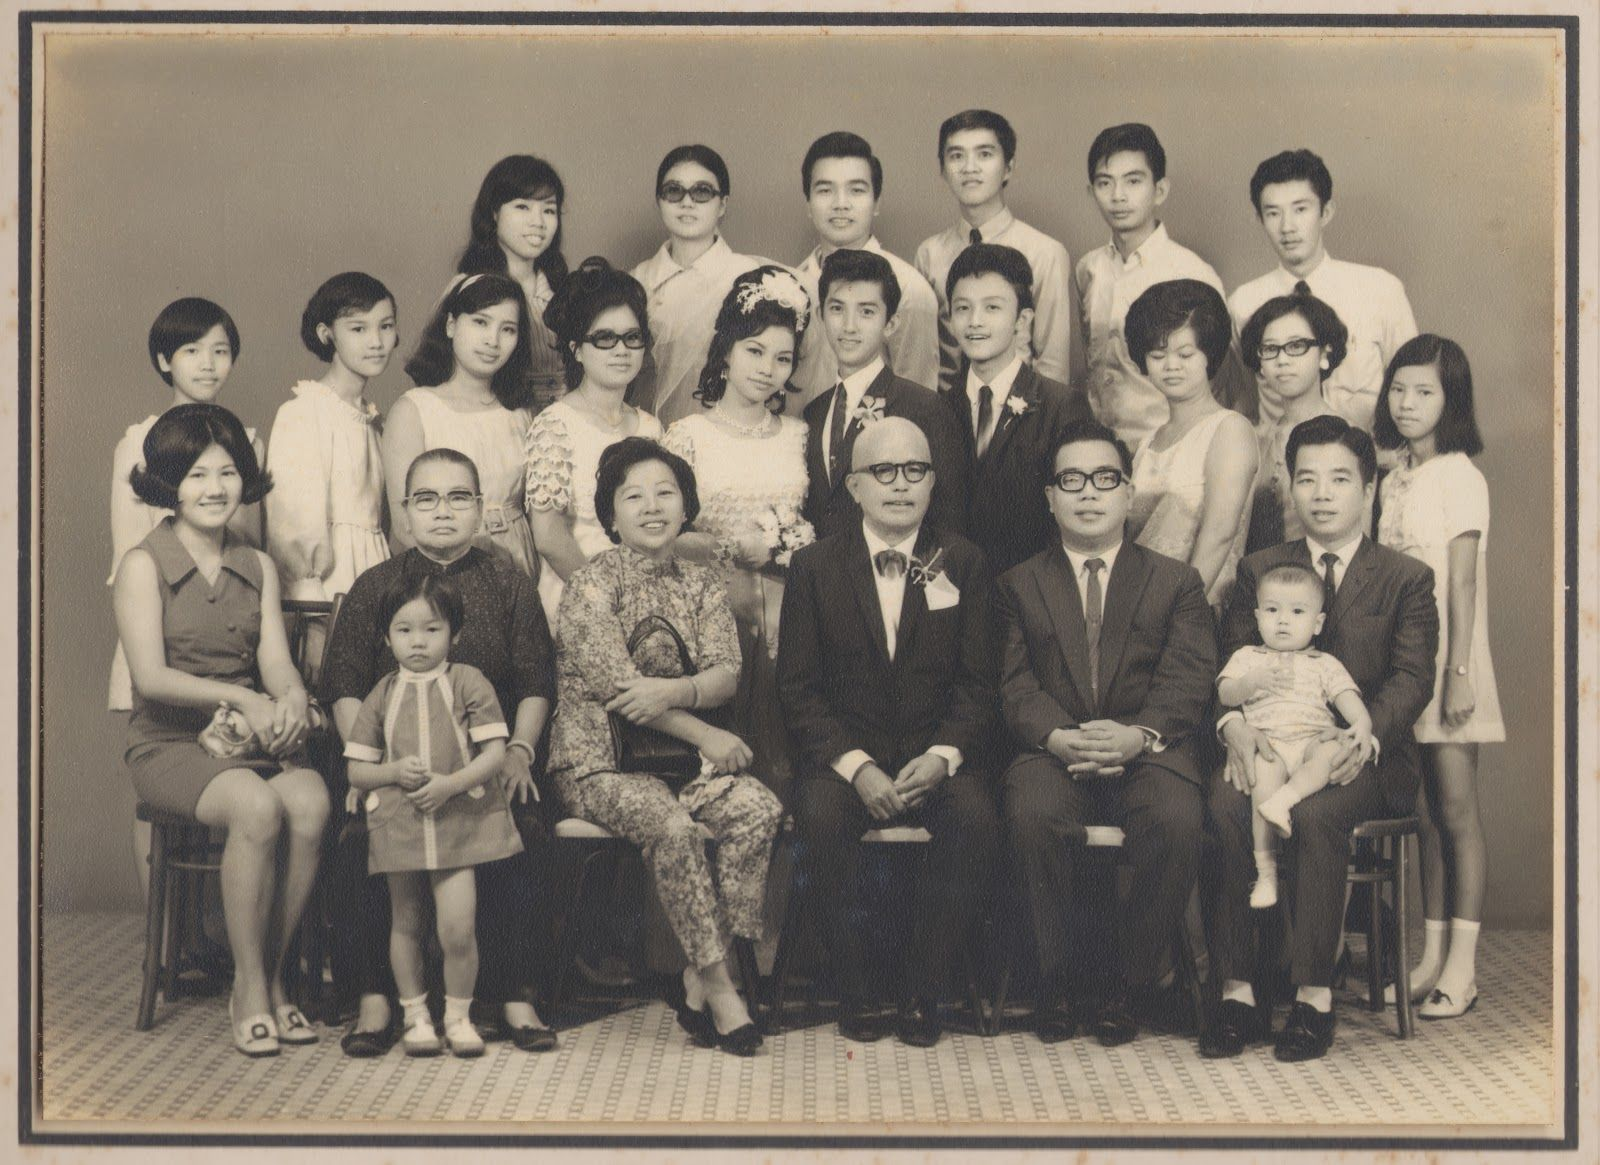 Lullabies To Terrorize: Vintage family photos prt. 2